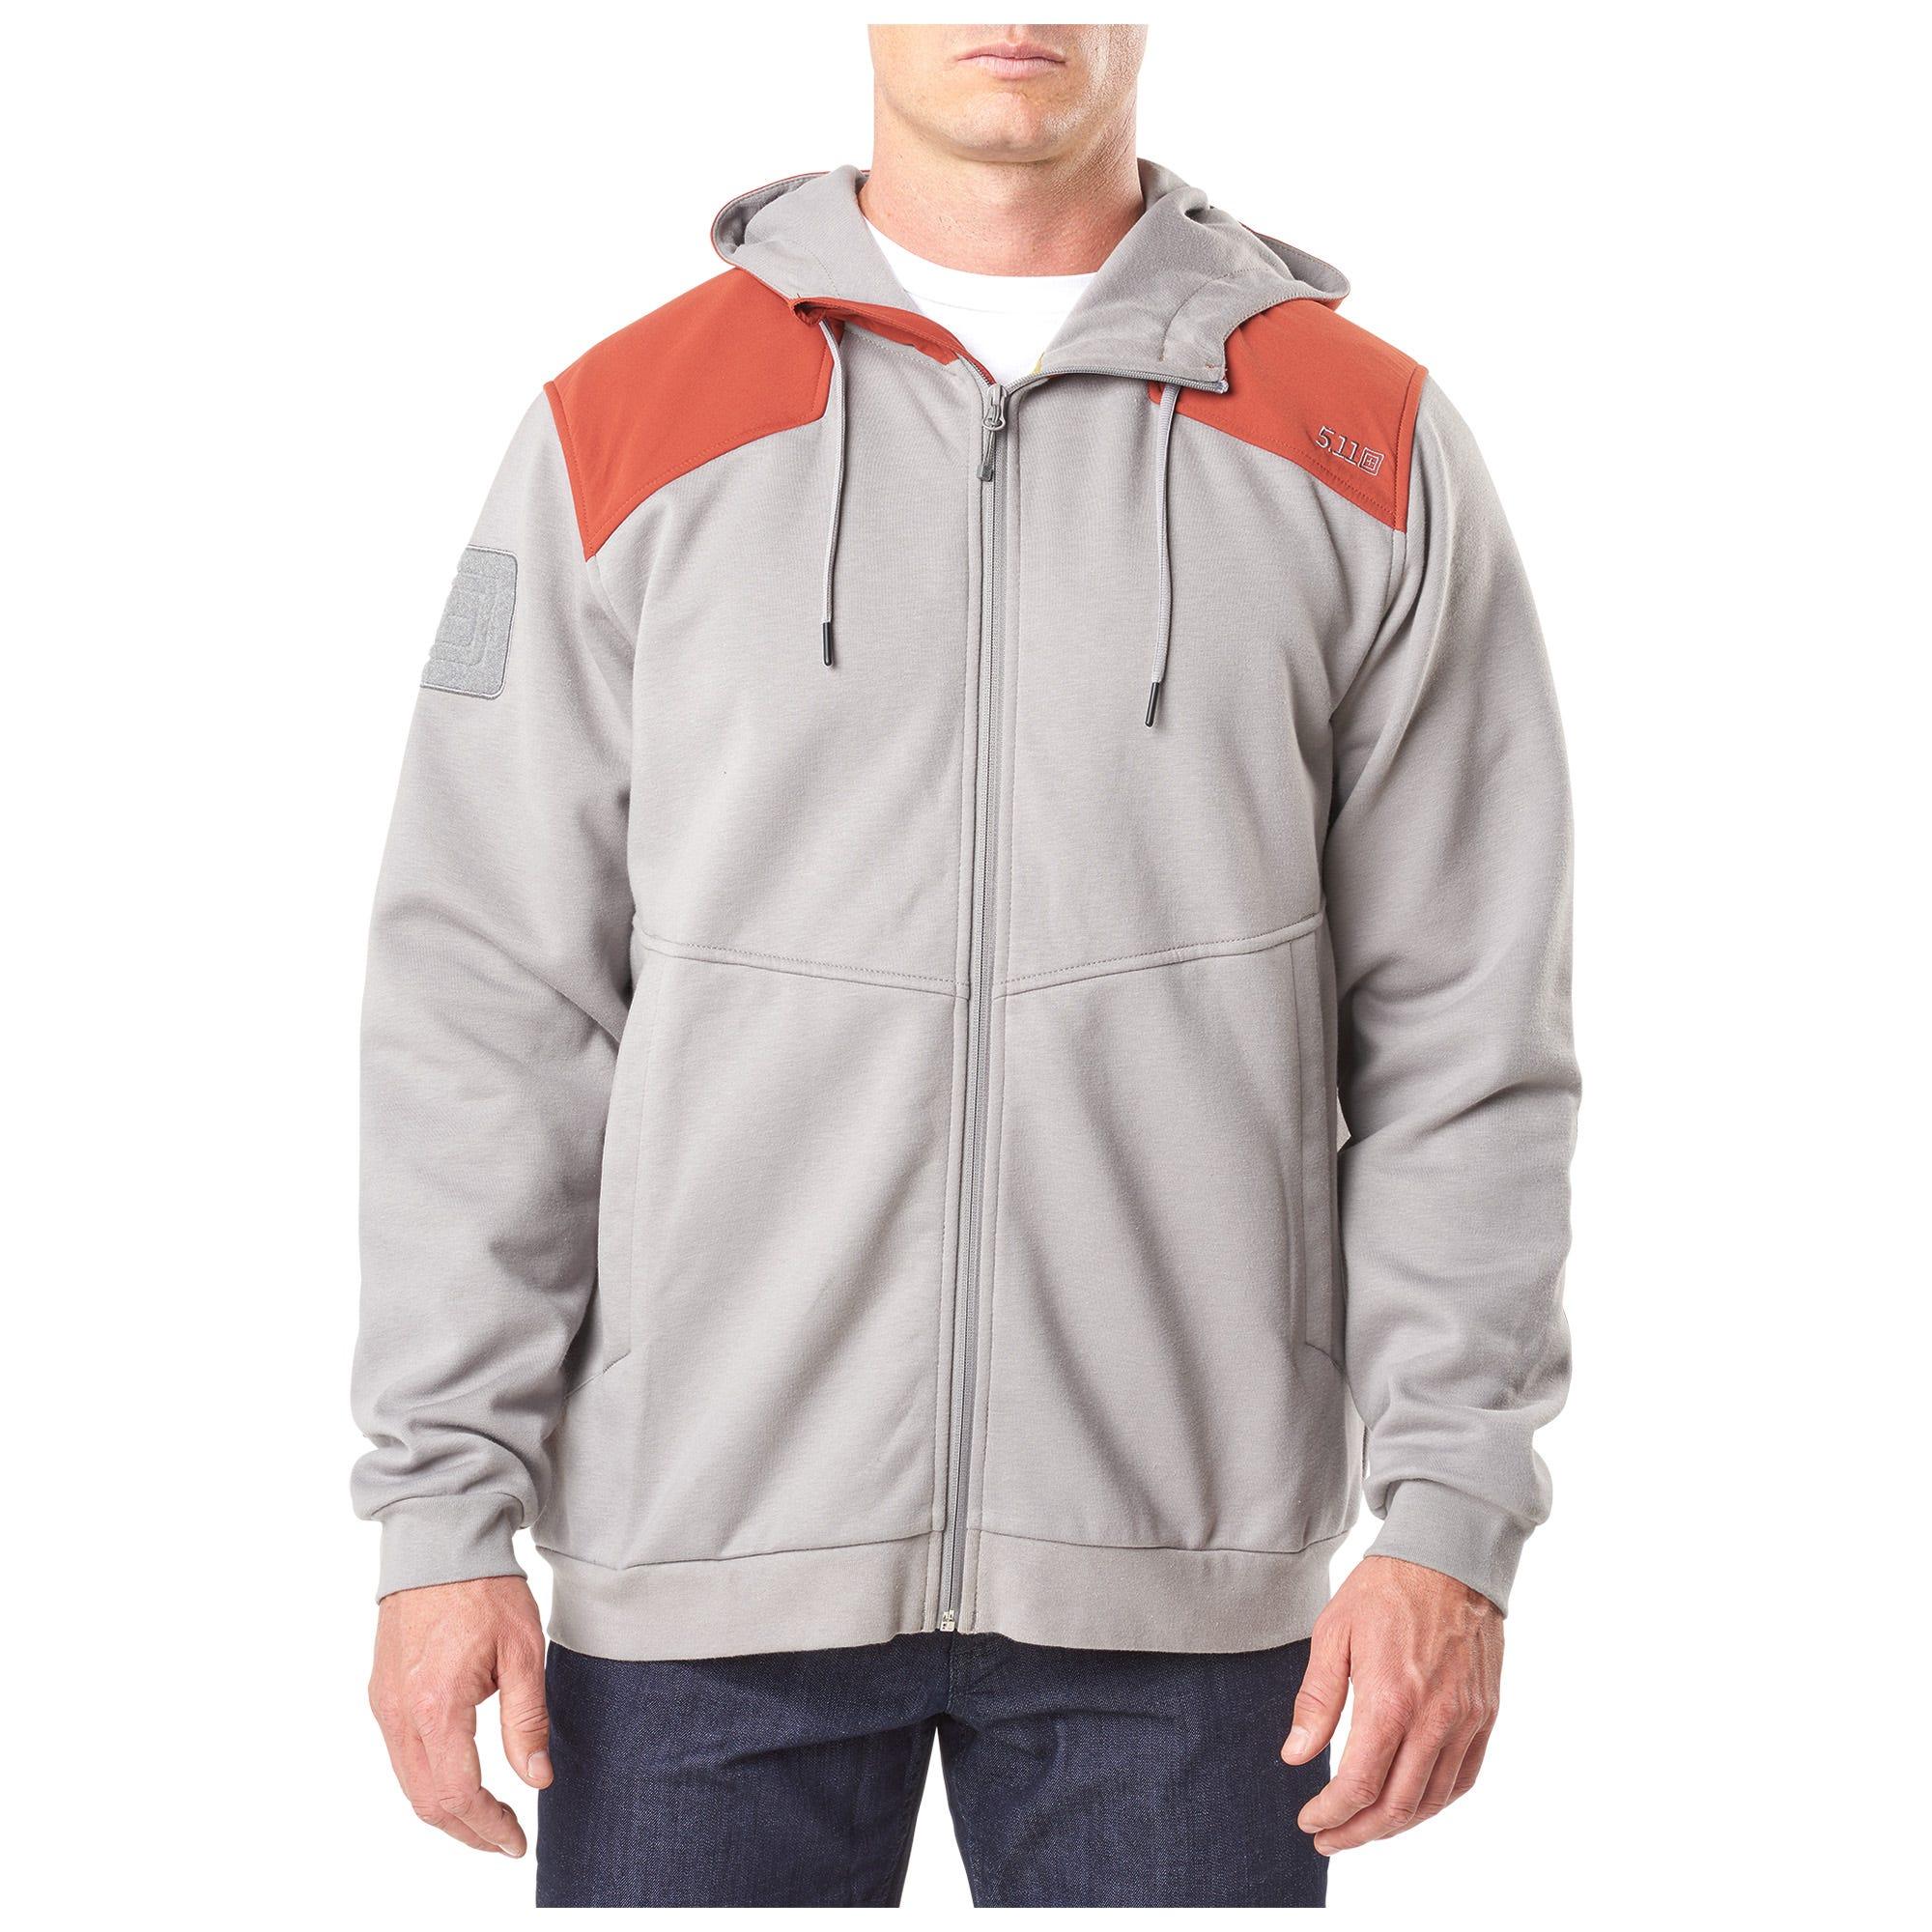 5.11 Tactical Men's Armory Jacket (Grey)